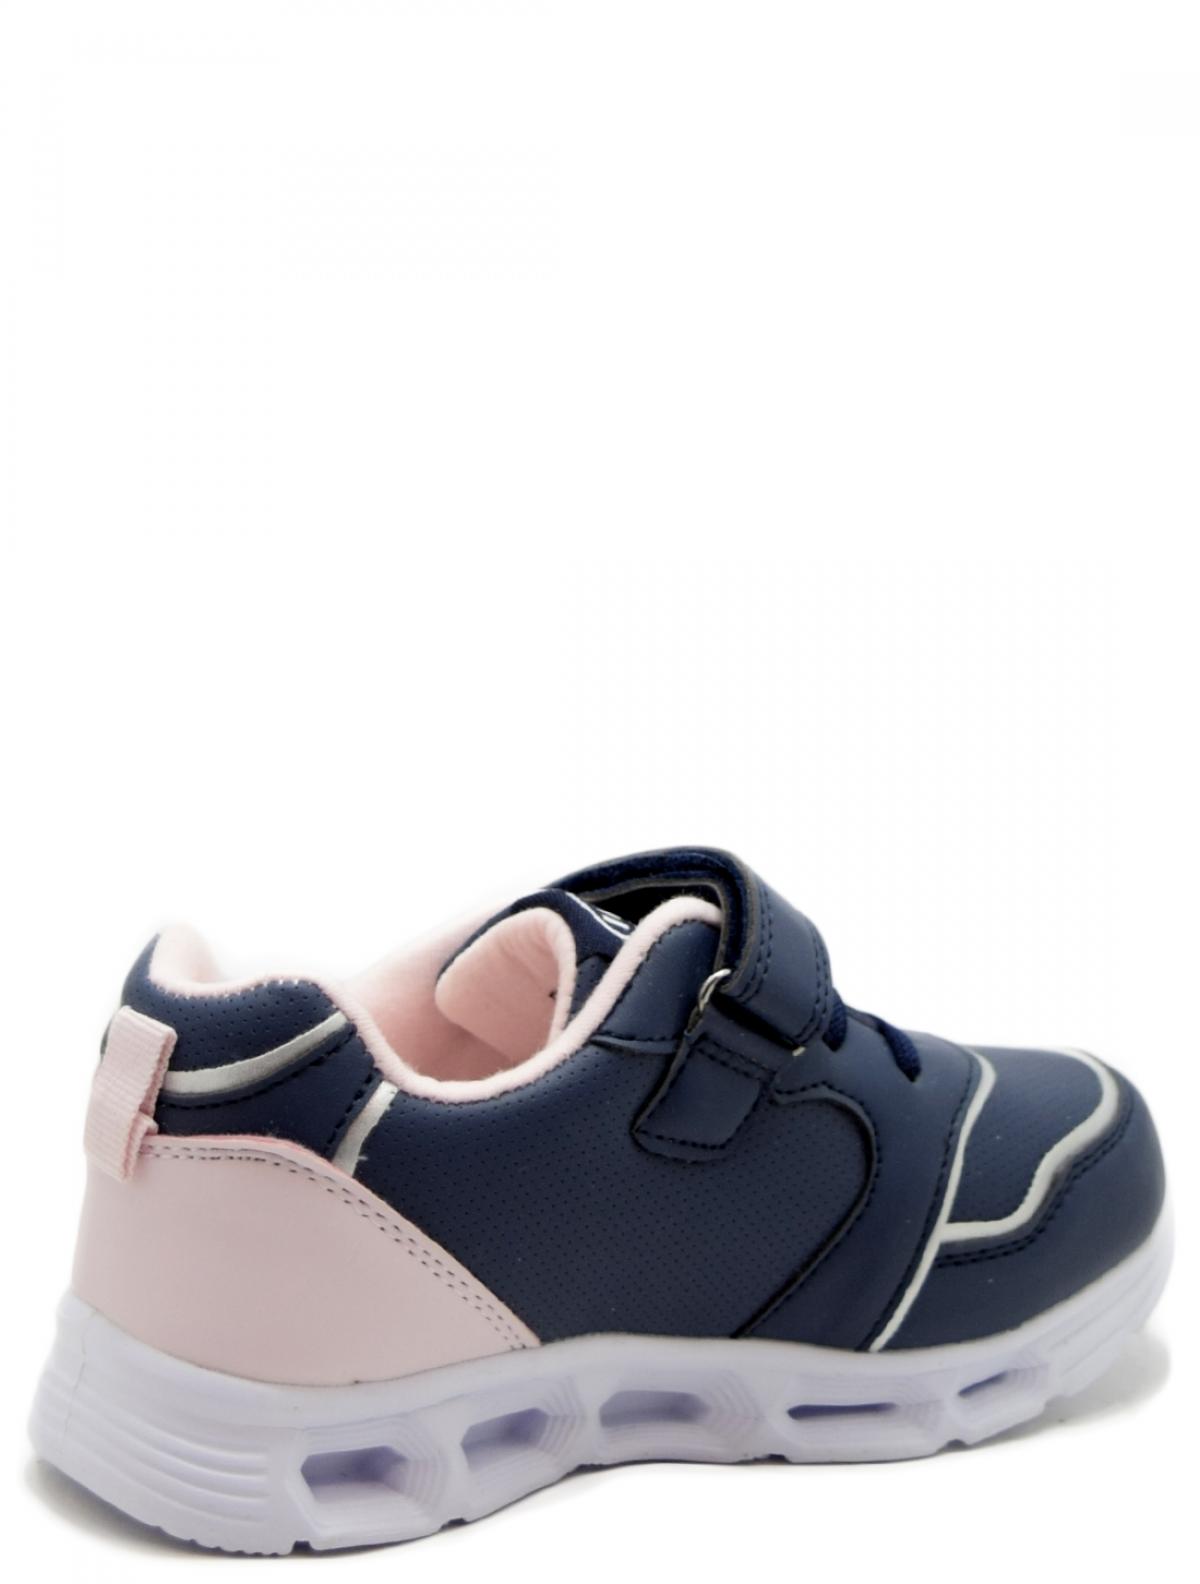 Ulet FL219-L04-13 кроссовки для девочки